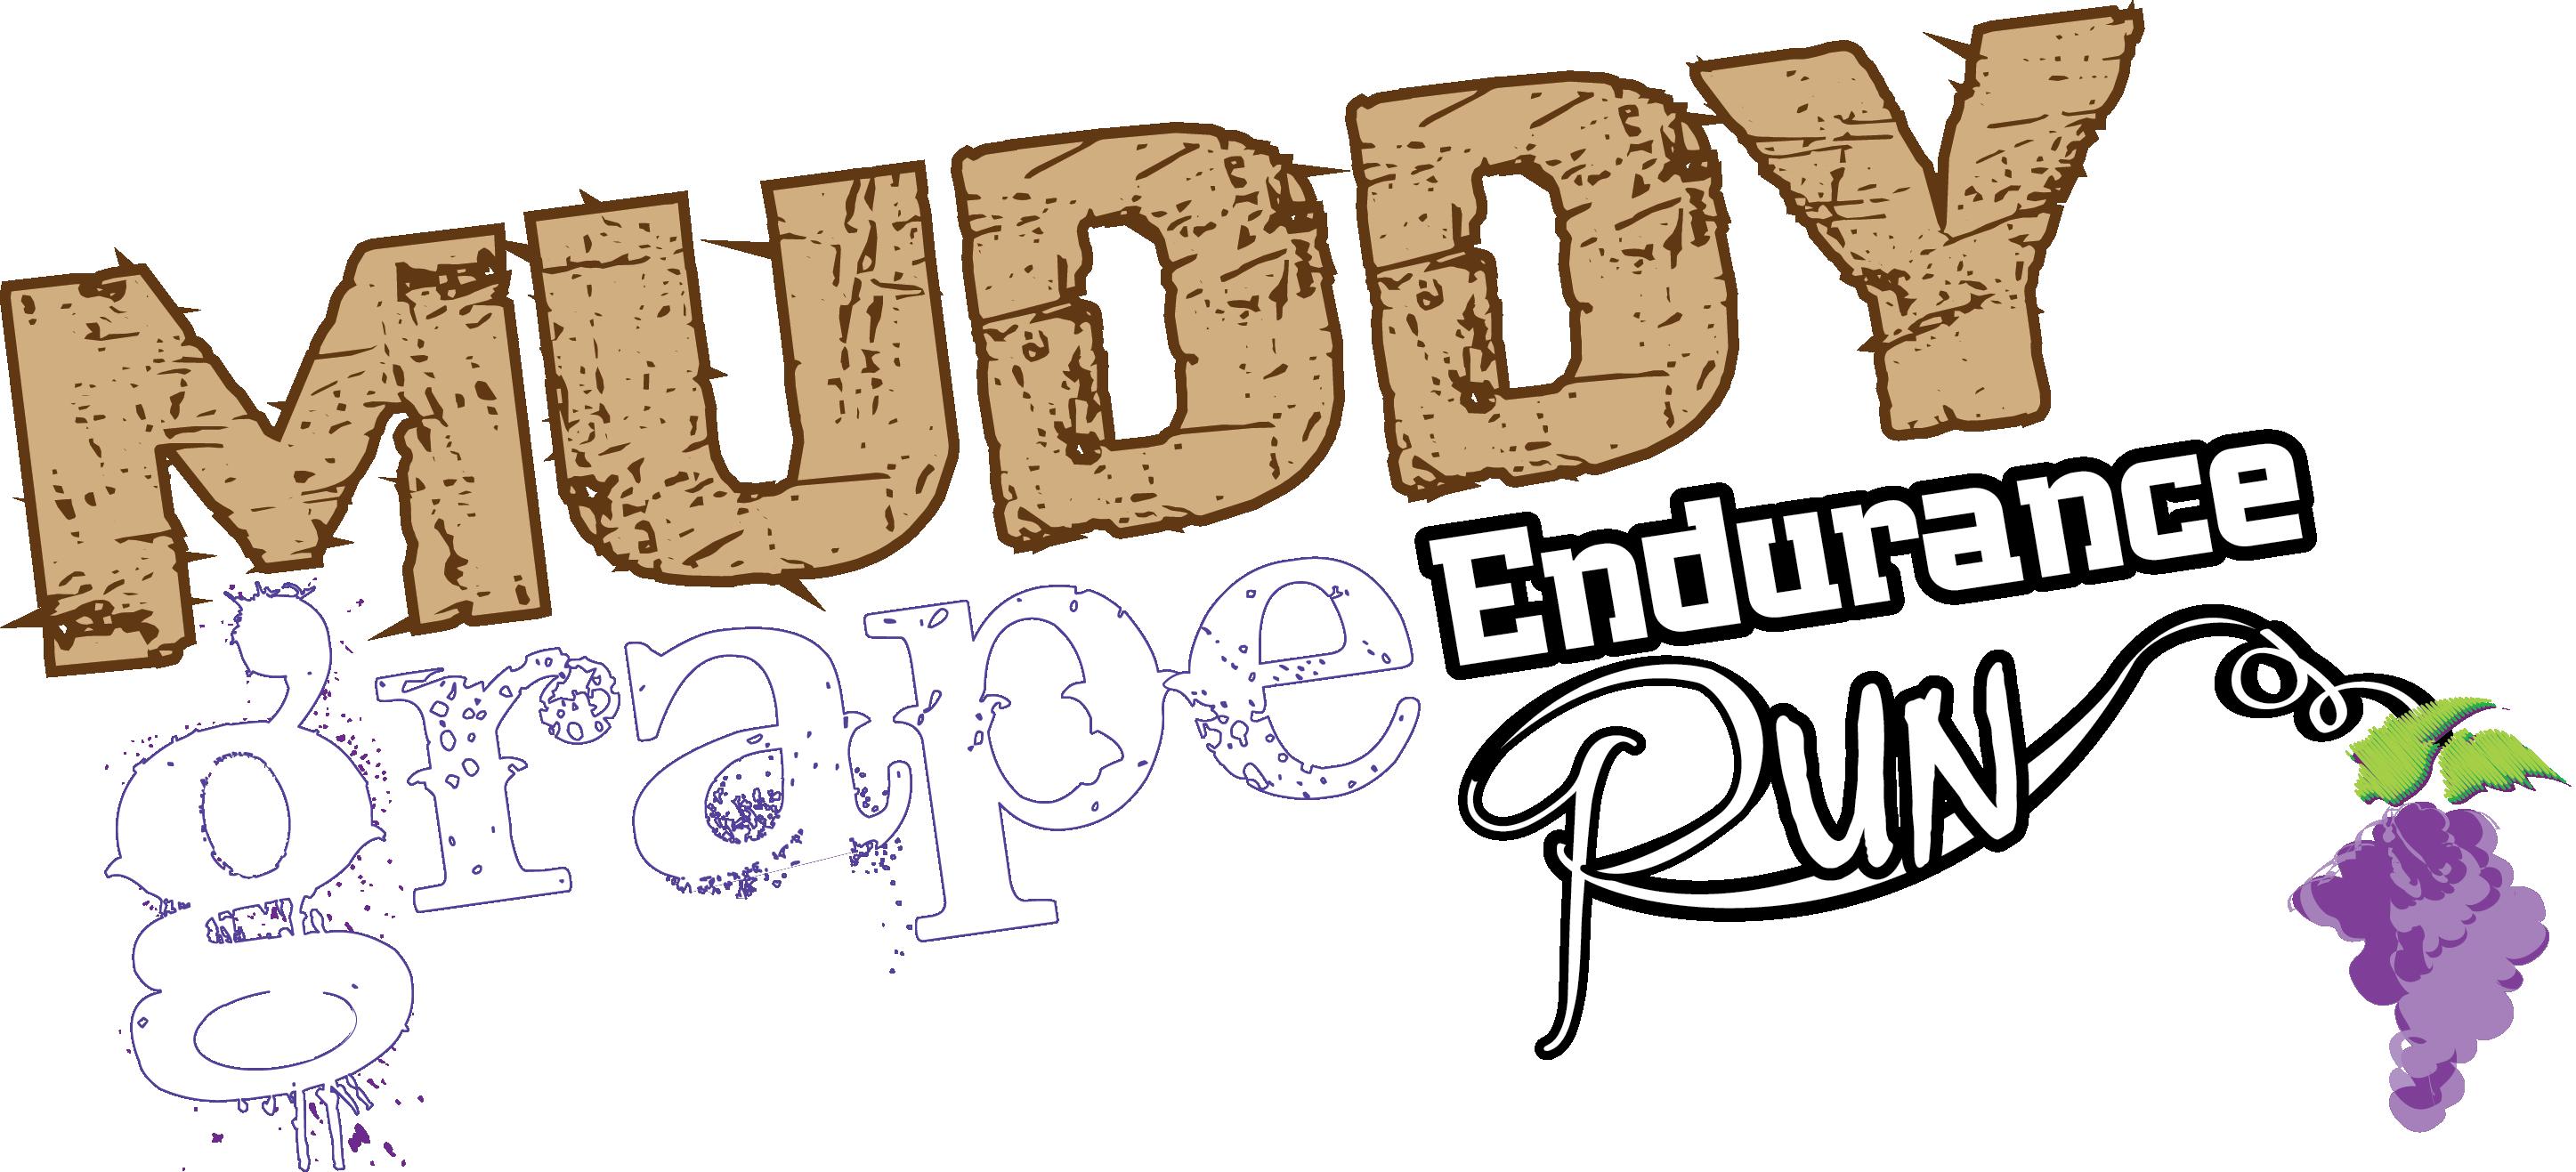 Fundraising muddygrape com muddygrapecom. Mud clipart muddy road